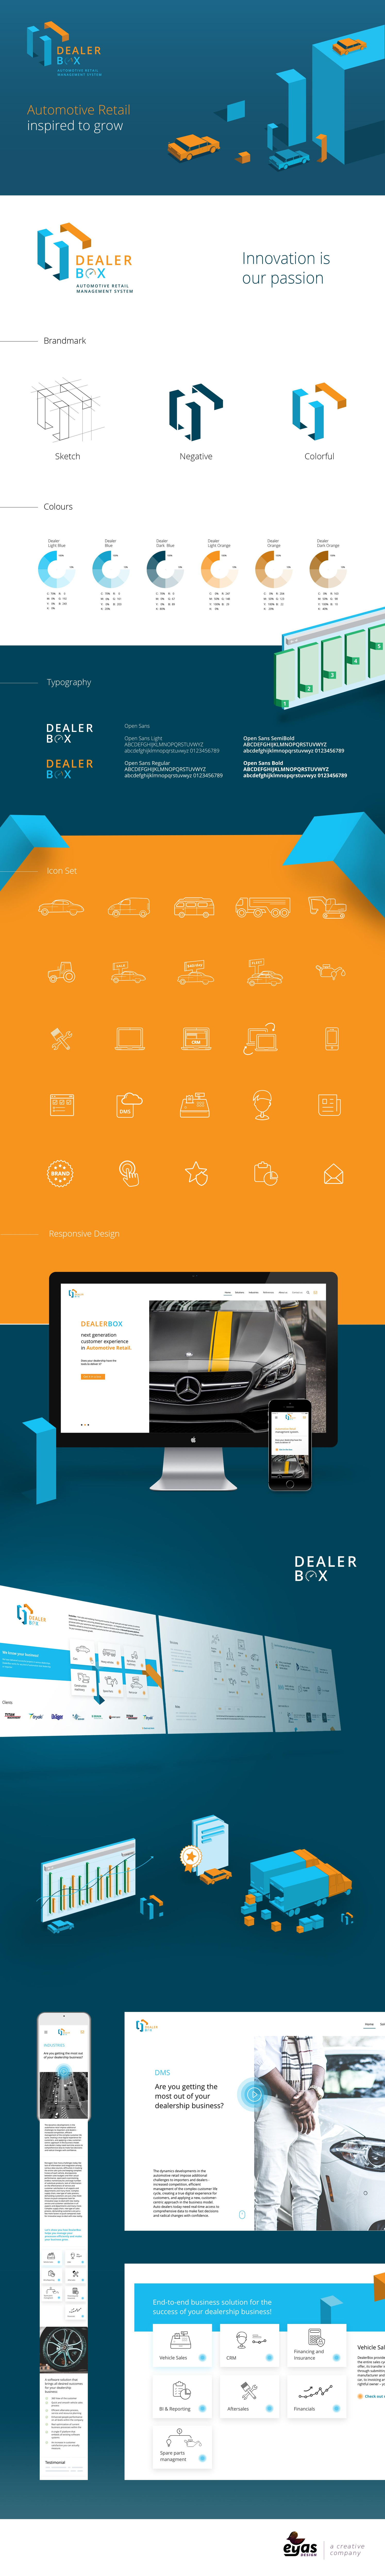 Eyas-design-dealerbox